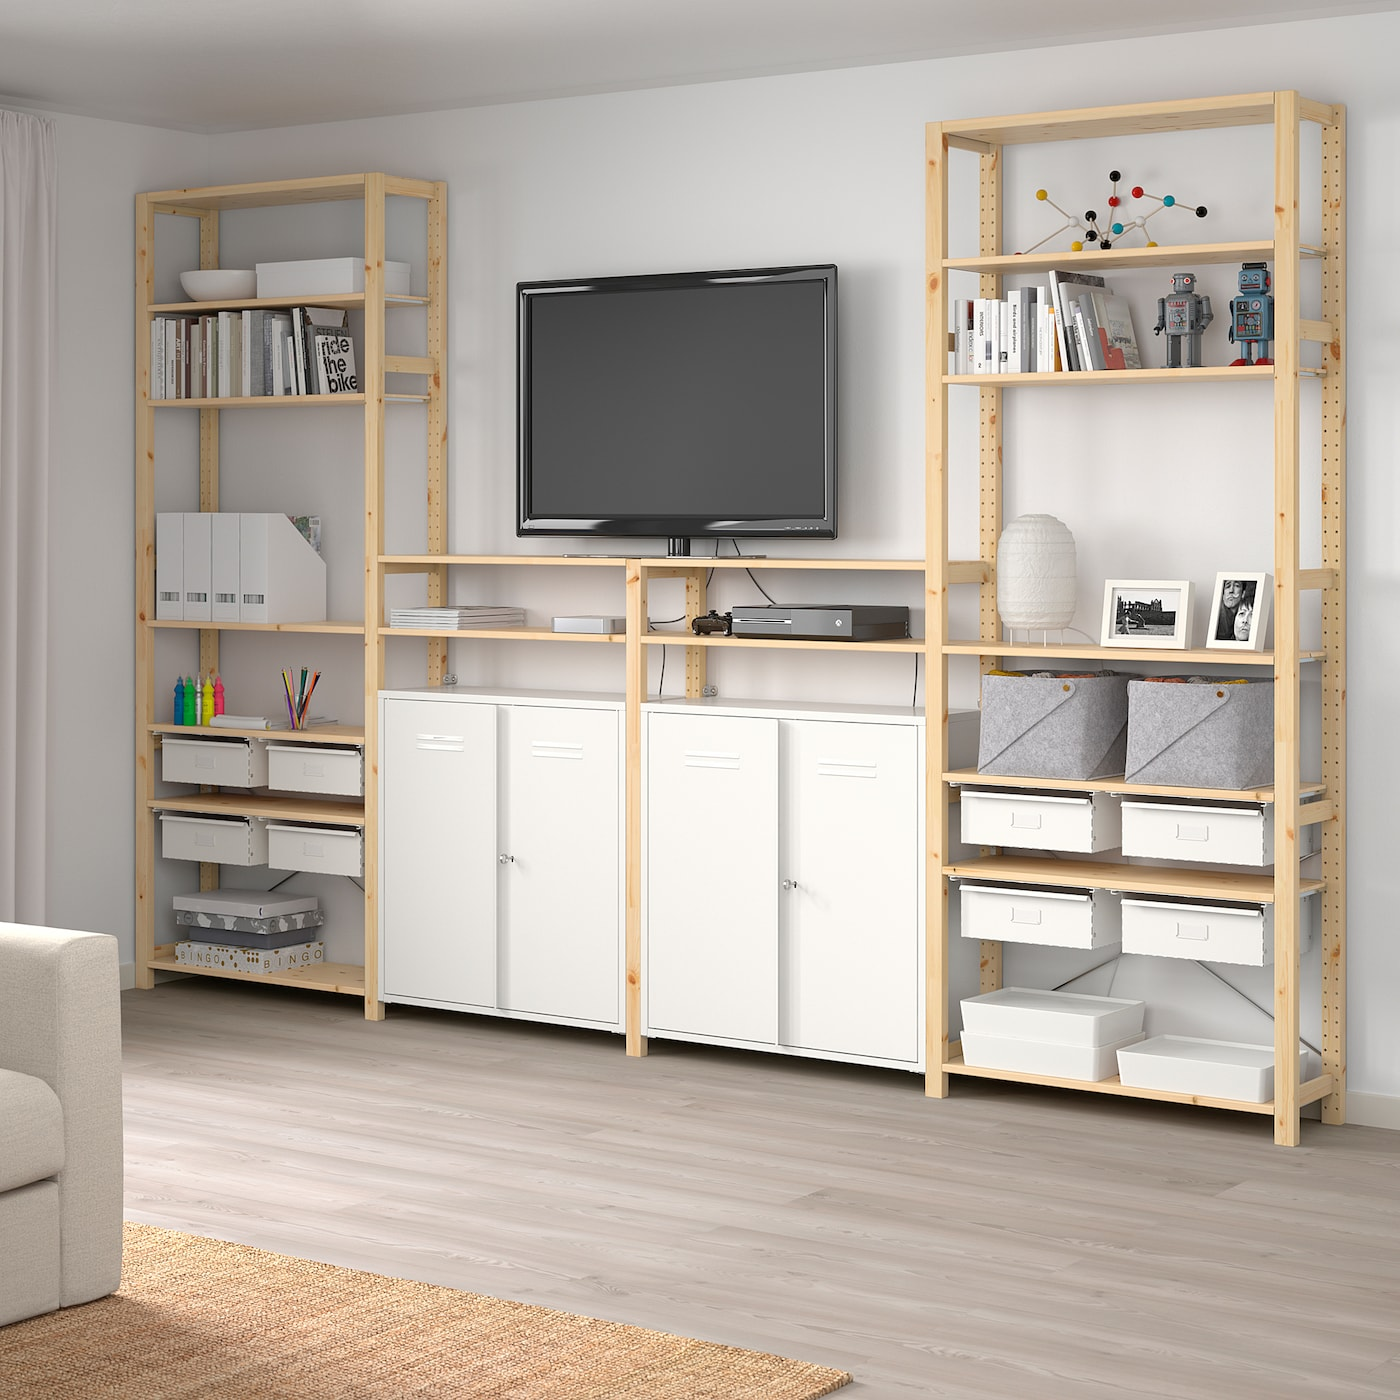 "IVAR 4 section storage combination, pine/white, 135 3/8x11 3/4x89 """